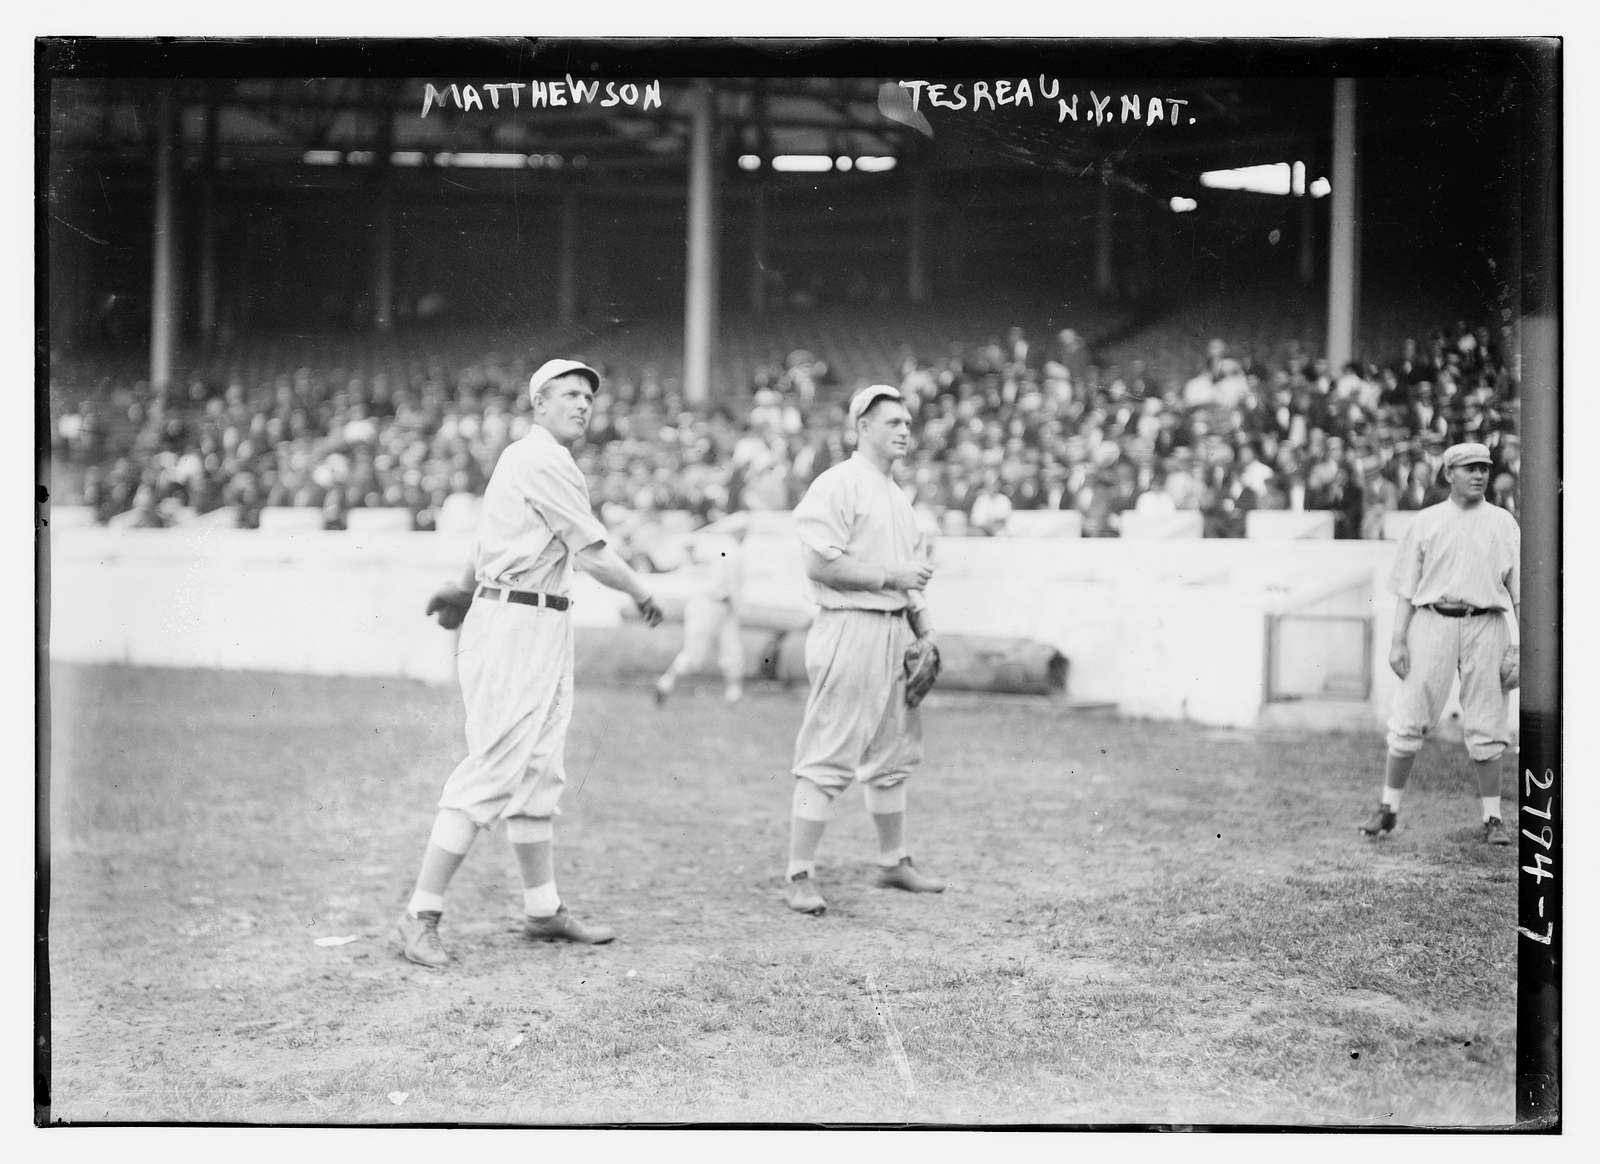 Christy Mathewson & Jeff Tesreau, New York NL, at Polo Grounds (baseball)